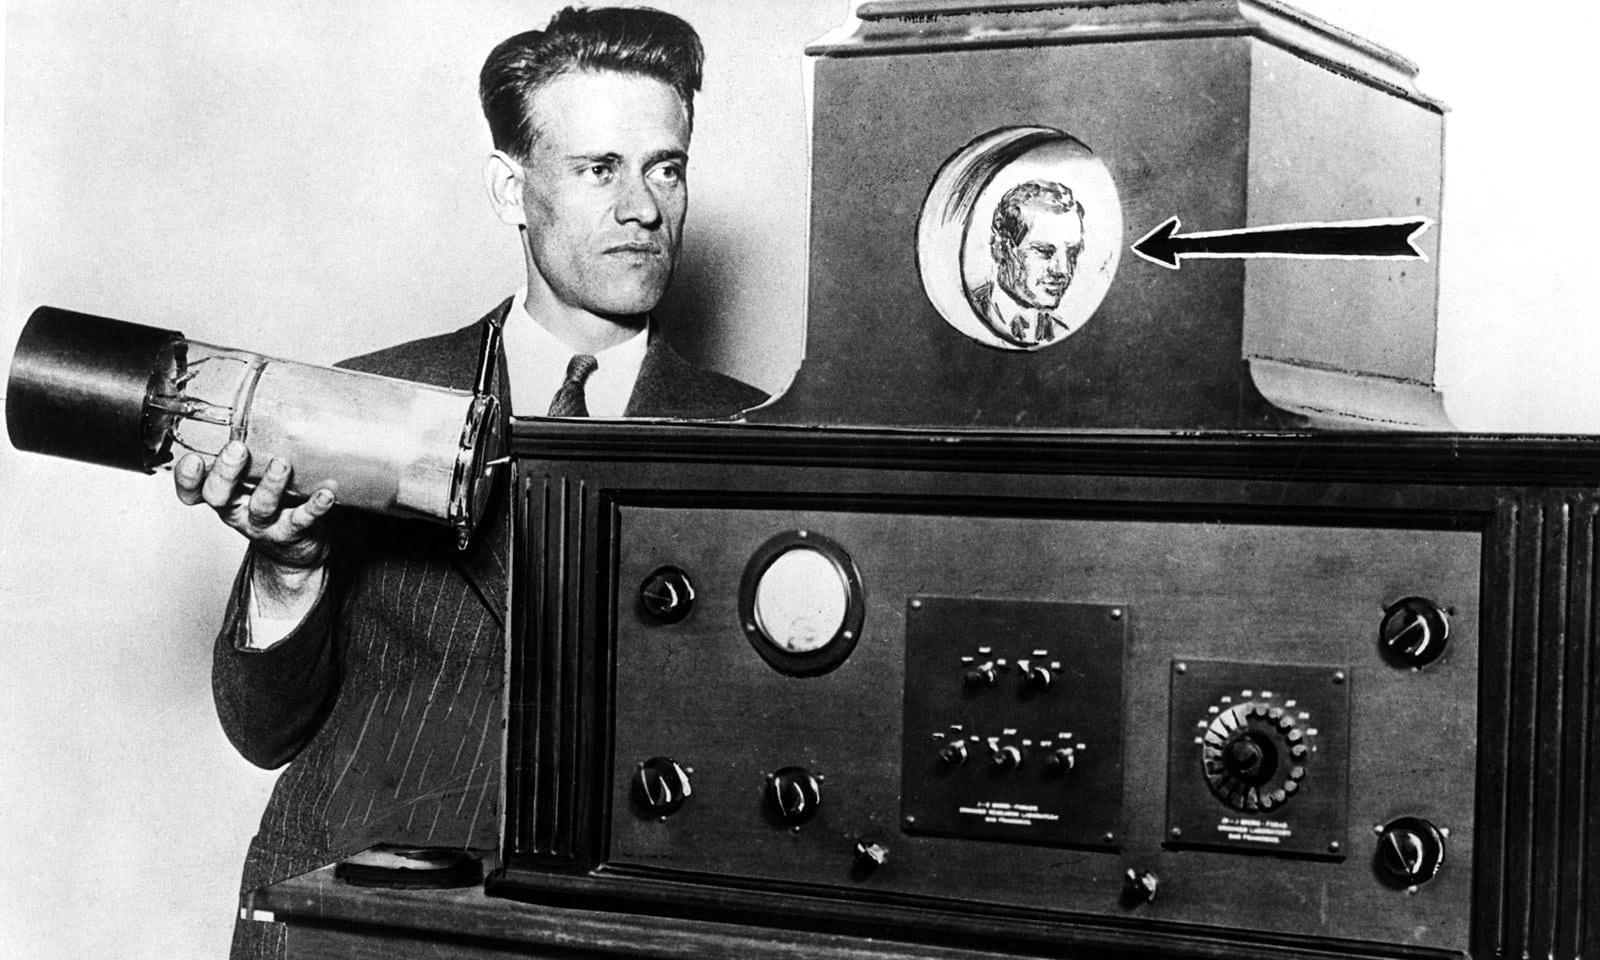 Philo T Farnsworth with his TV